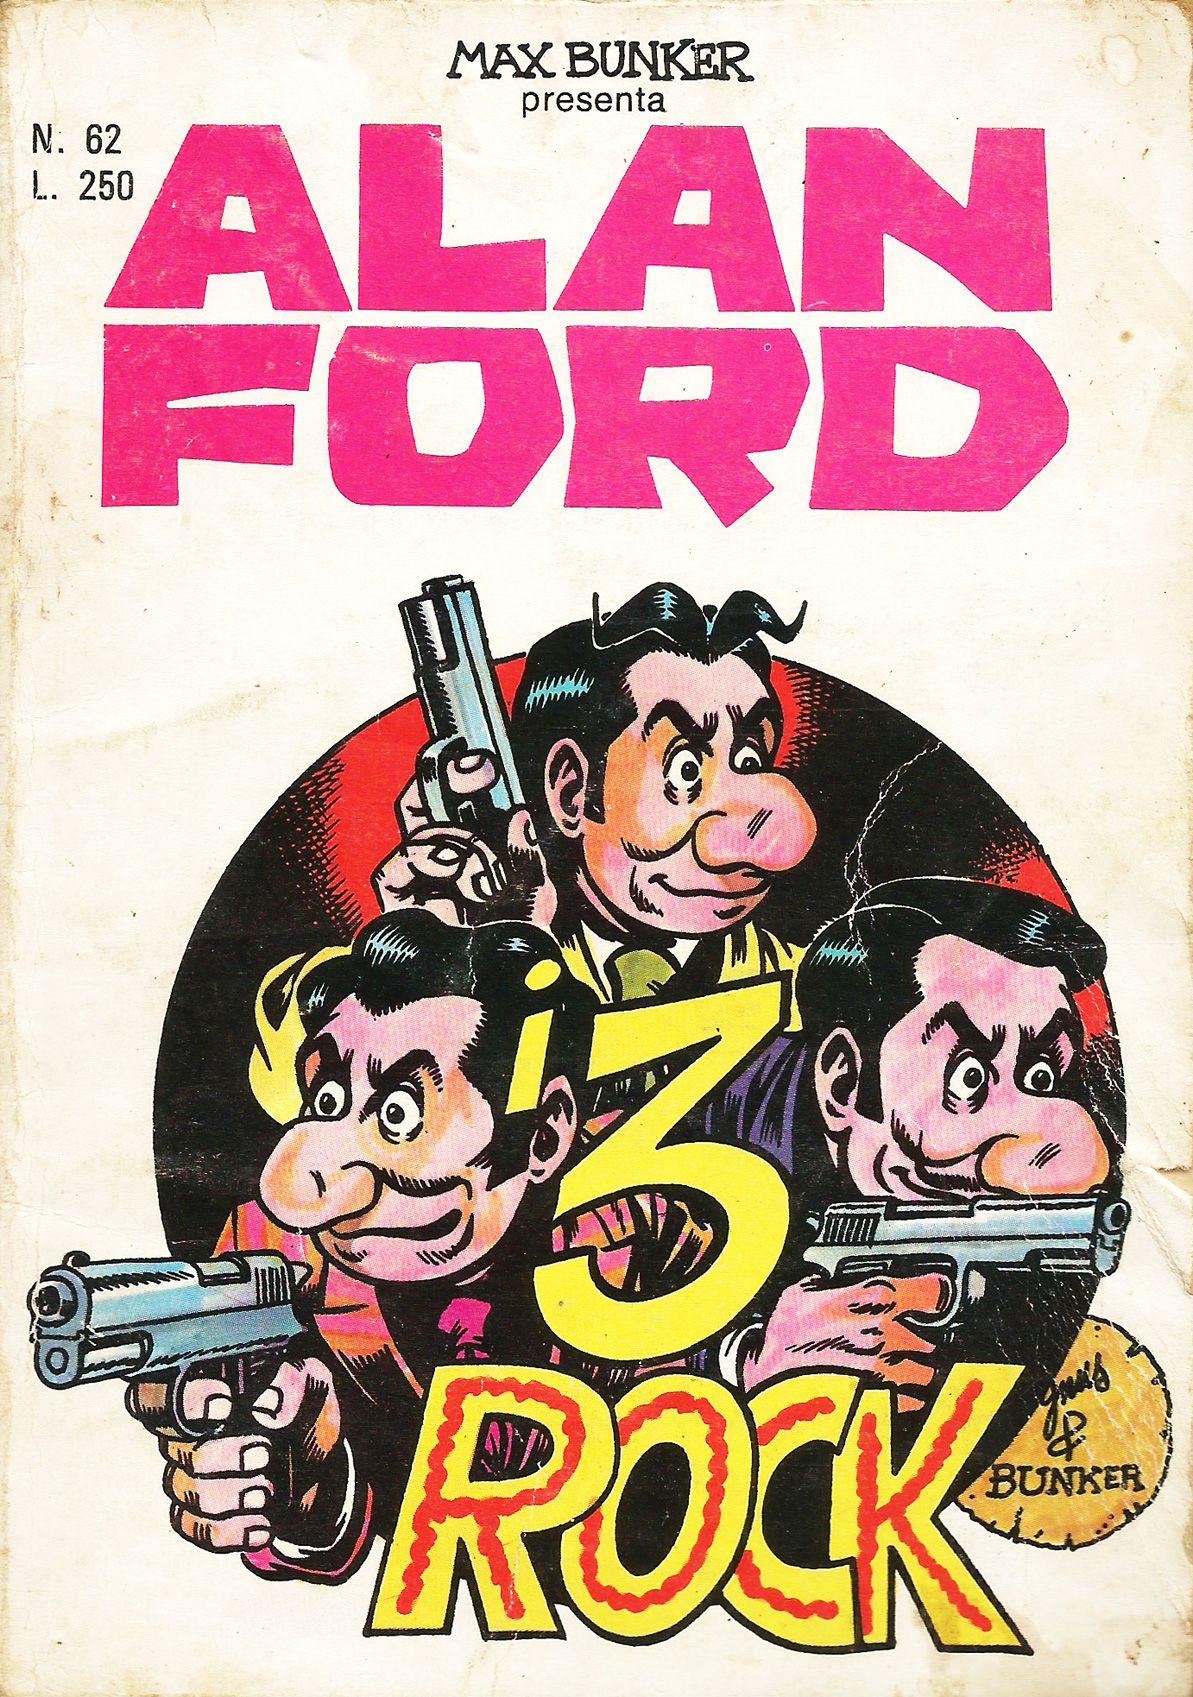 Alan ford gruppo t n t ubc enciclopedia online del fumetto - Alan Ford N 62 I 3 Rock Di Magnus Roberto Raviola